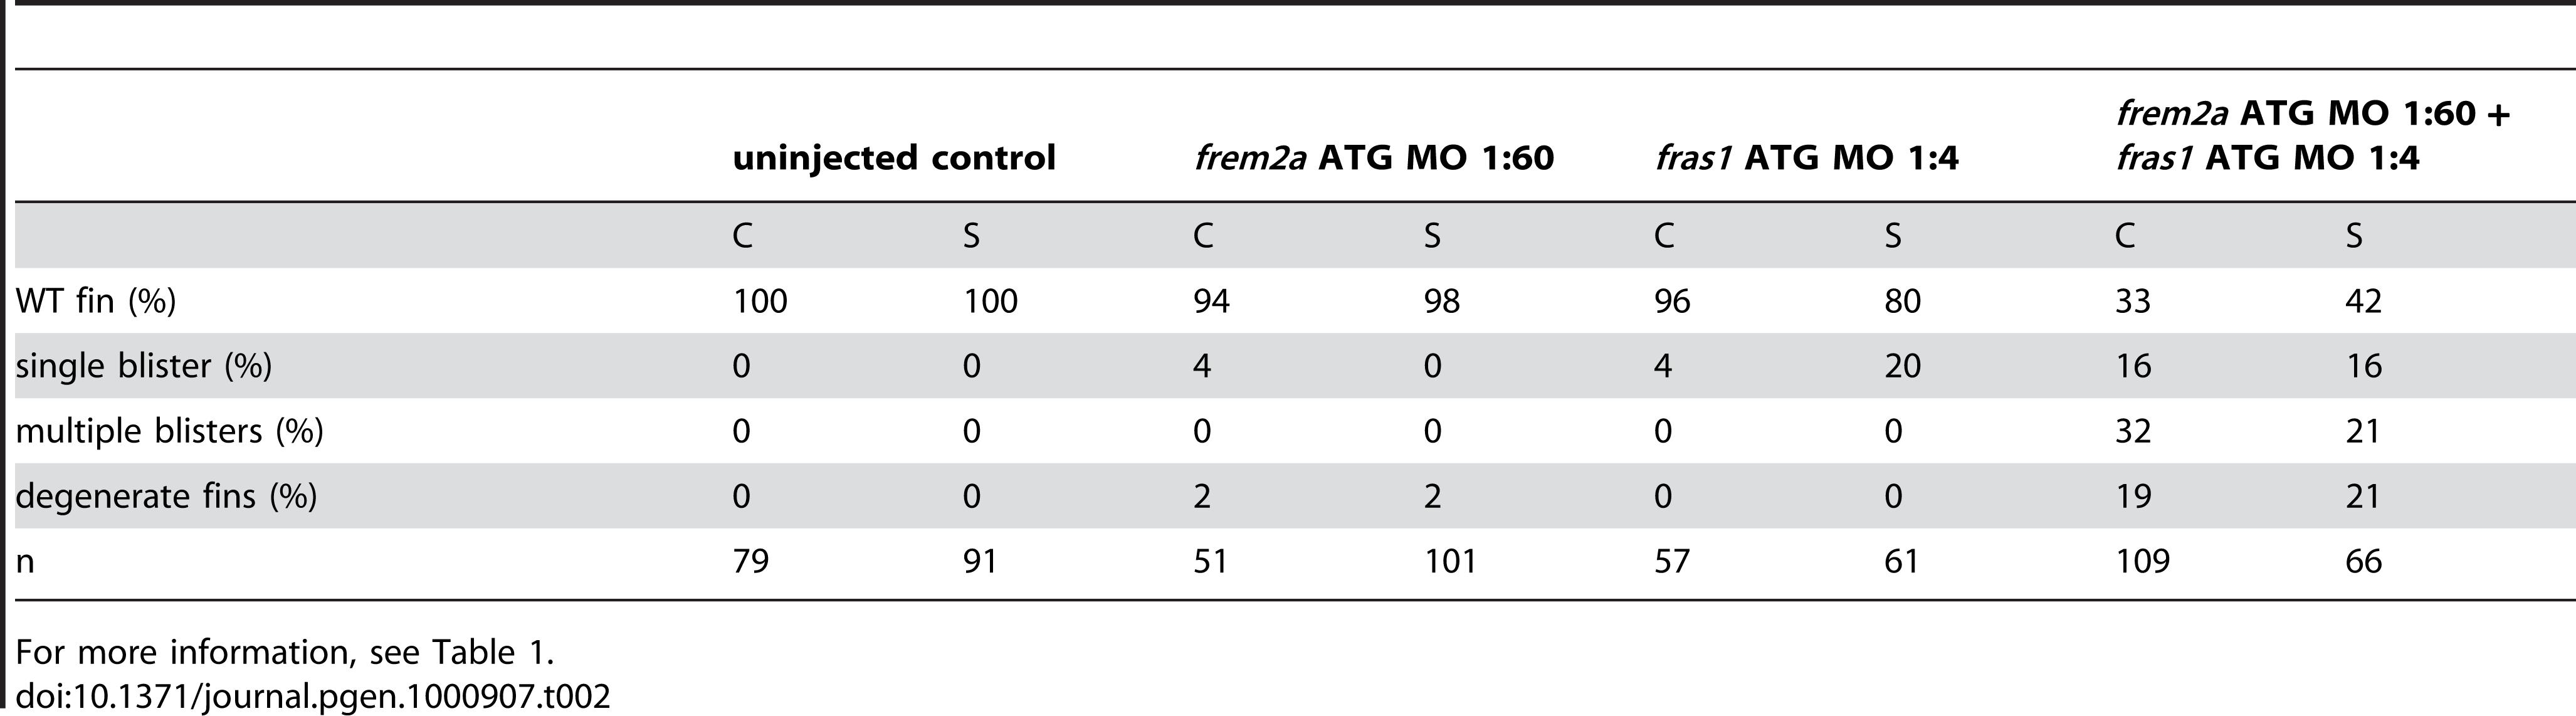 Synergistic interaction between <i>frem2a</i> and <i>fras1</i>.